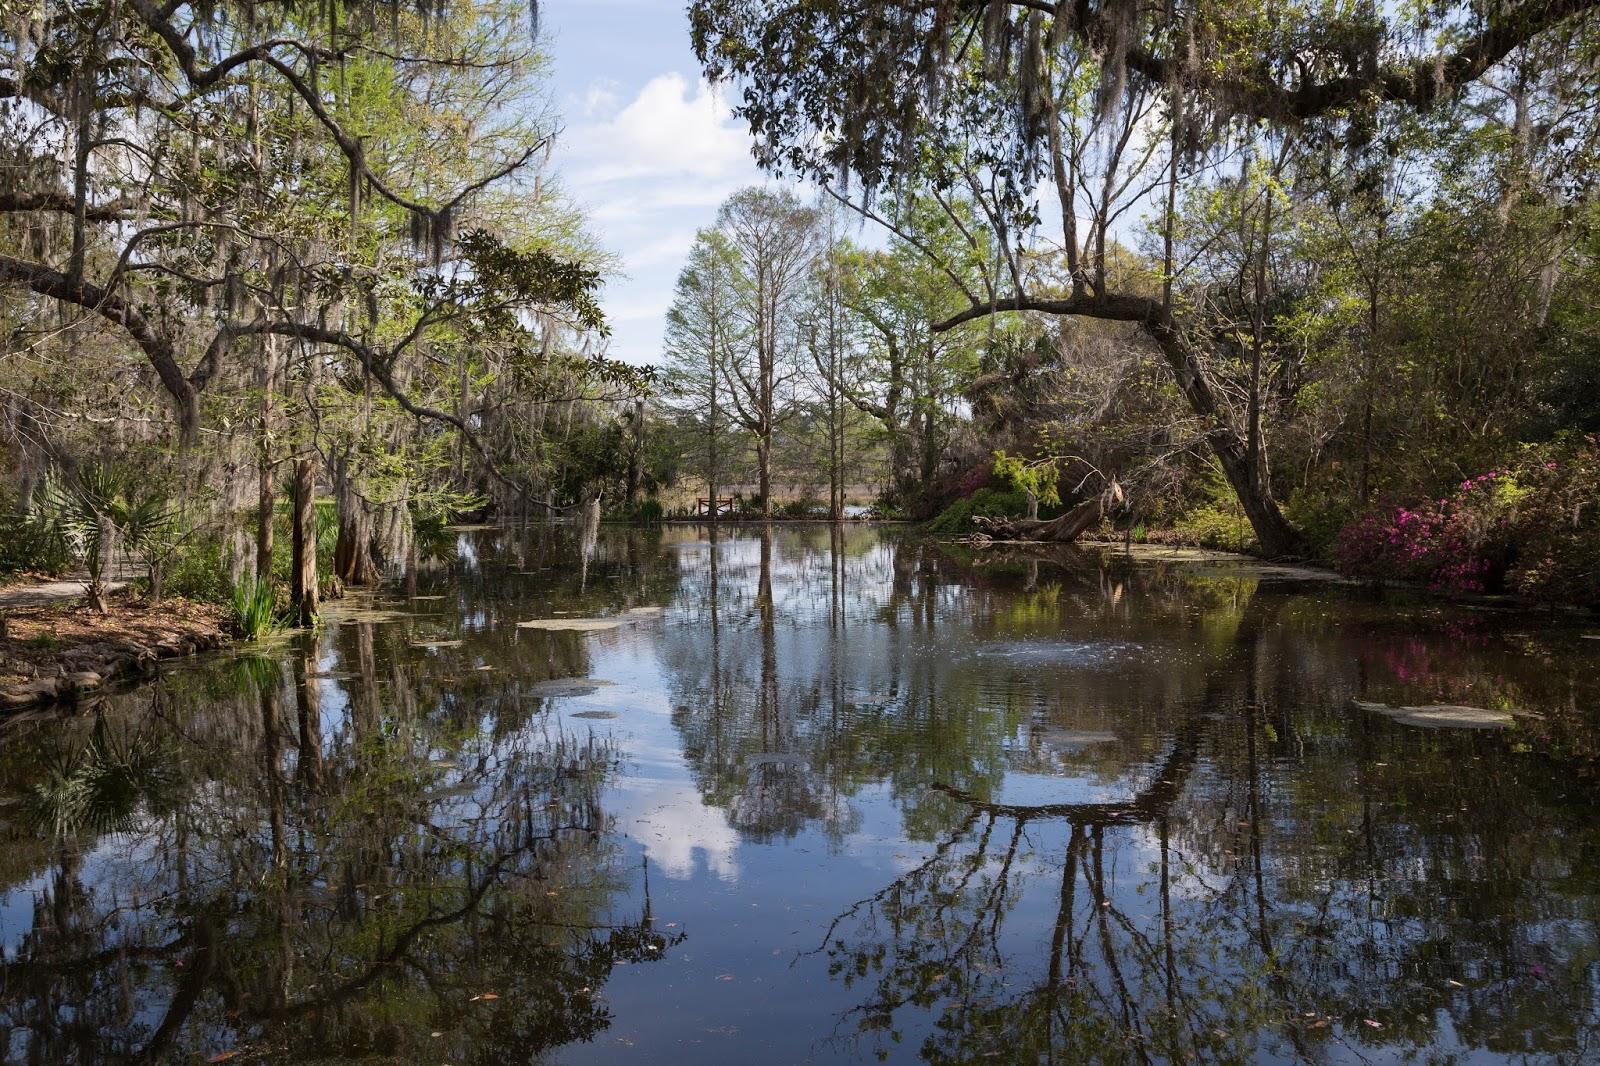 Charleston Daily Photo: Swamp Walking - Magnolia Plantation